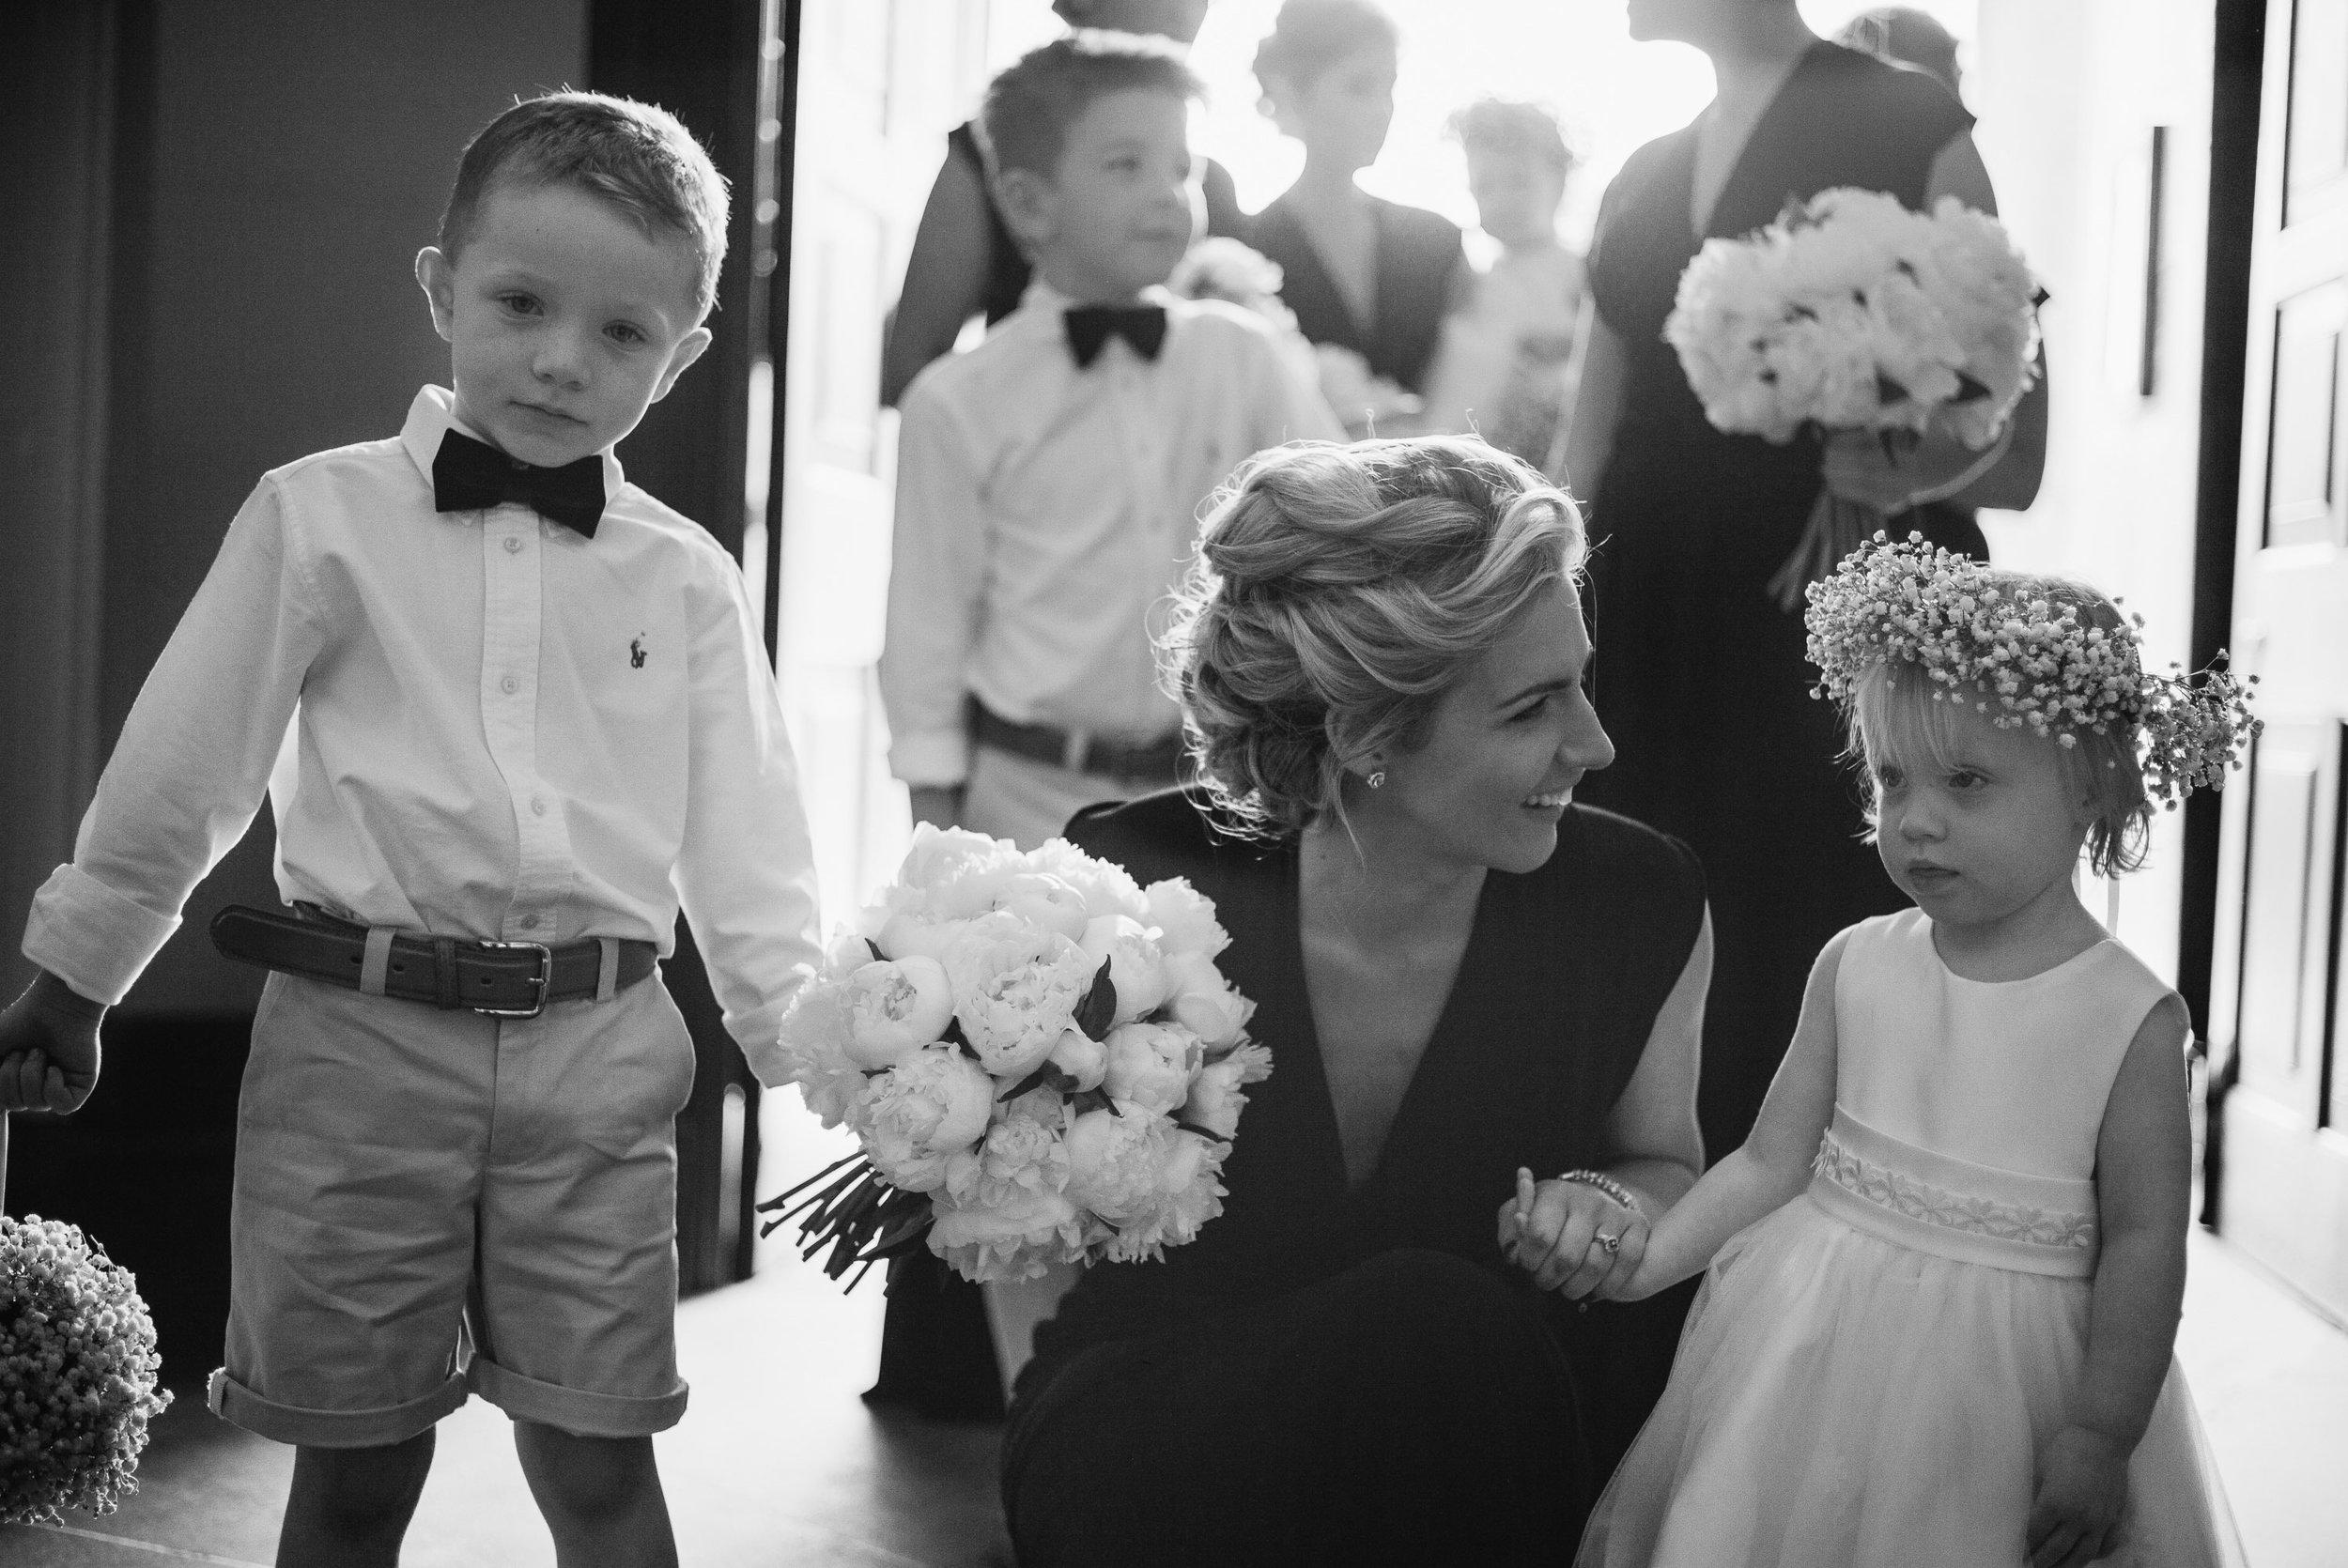 Joshua_Fray_Wedding_Photography-5_cd2lyx.jpg